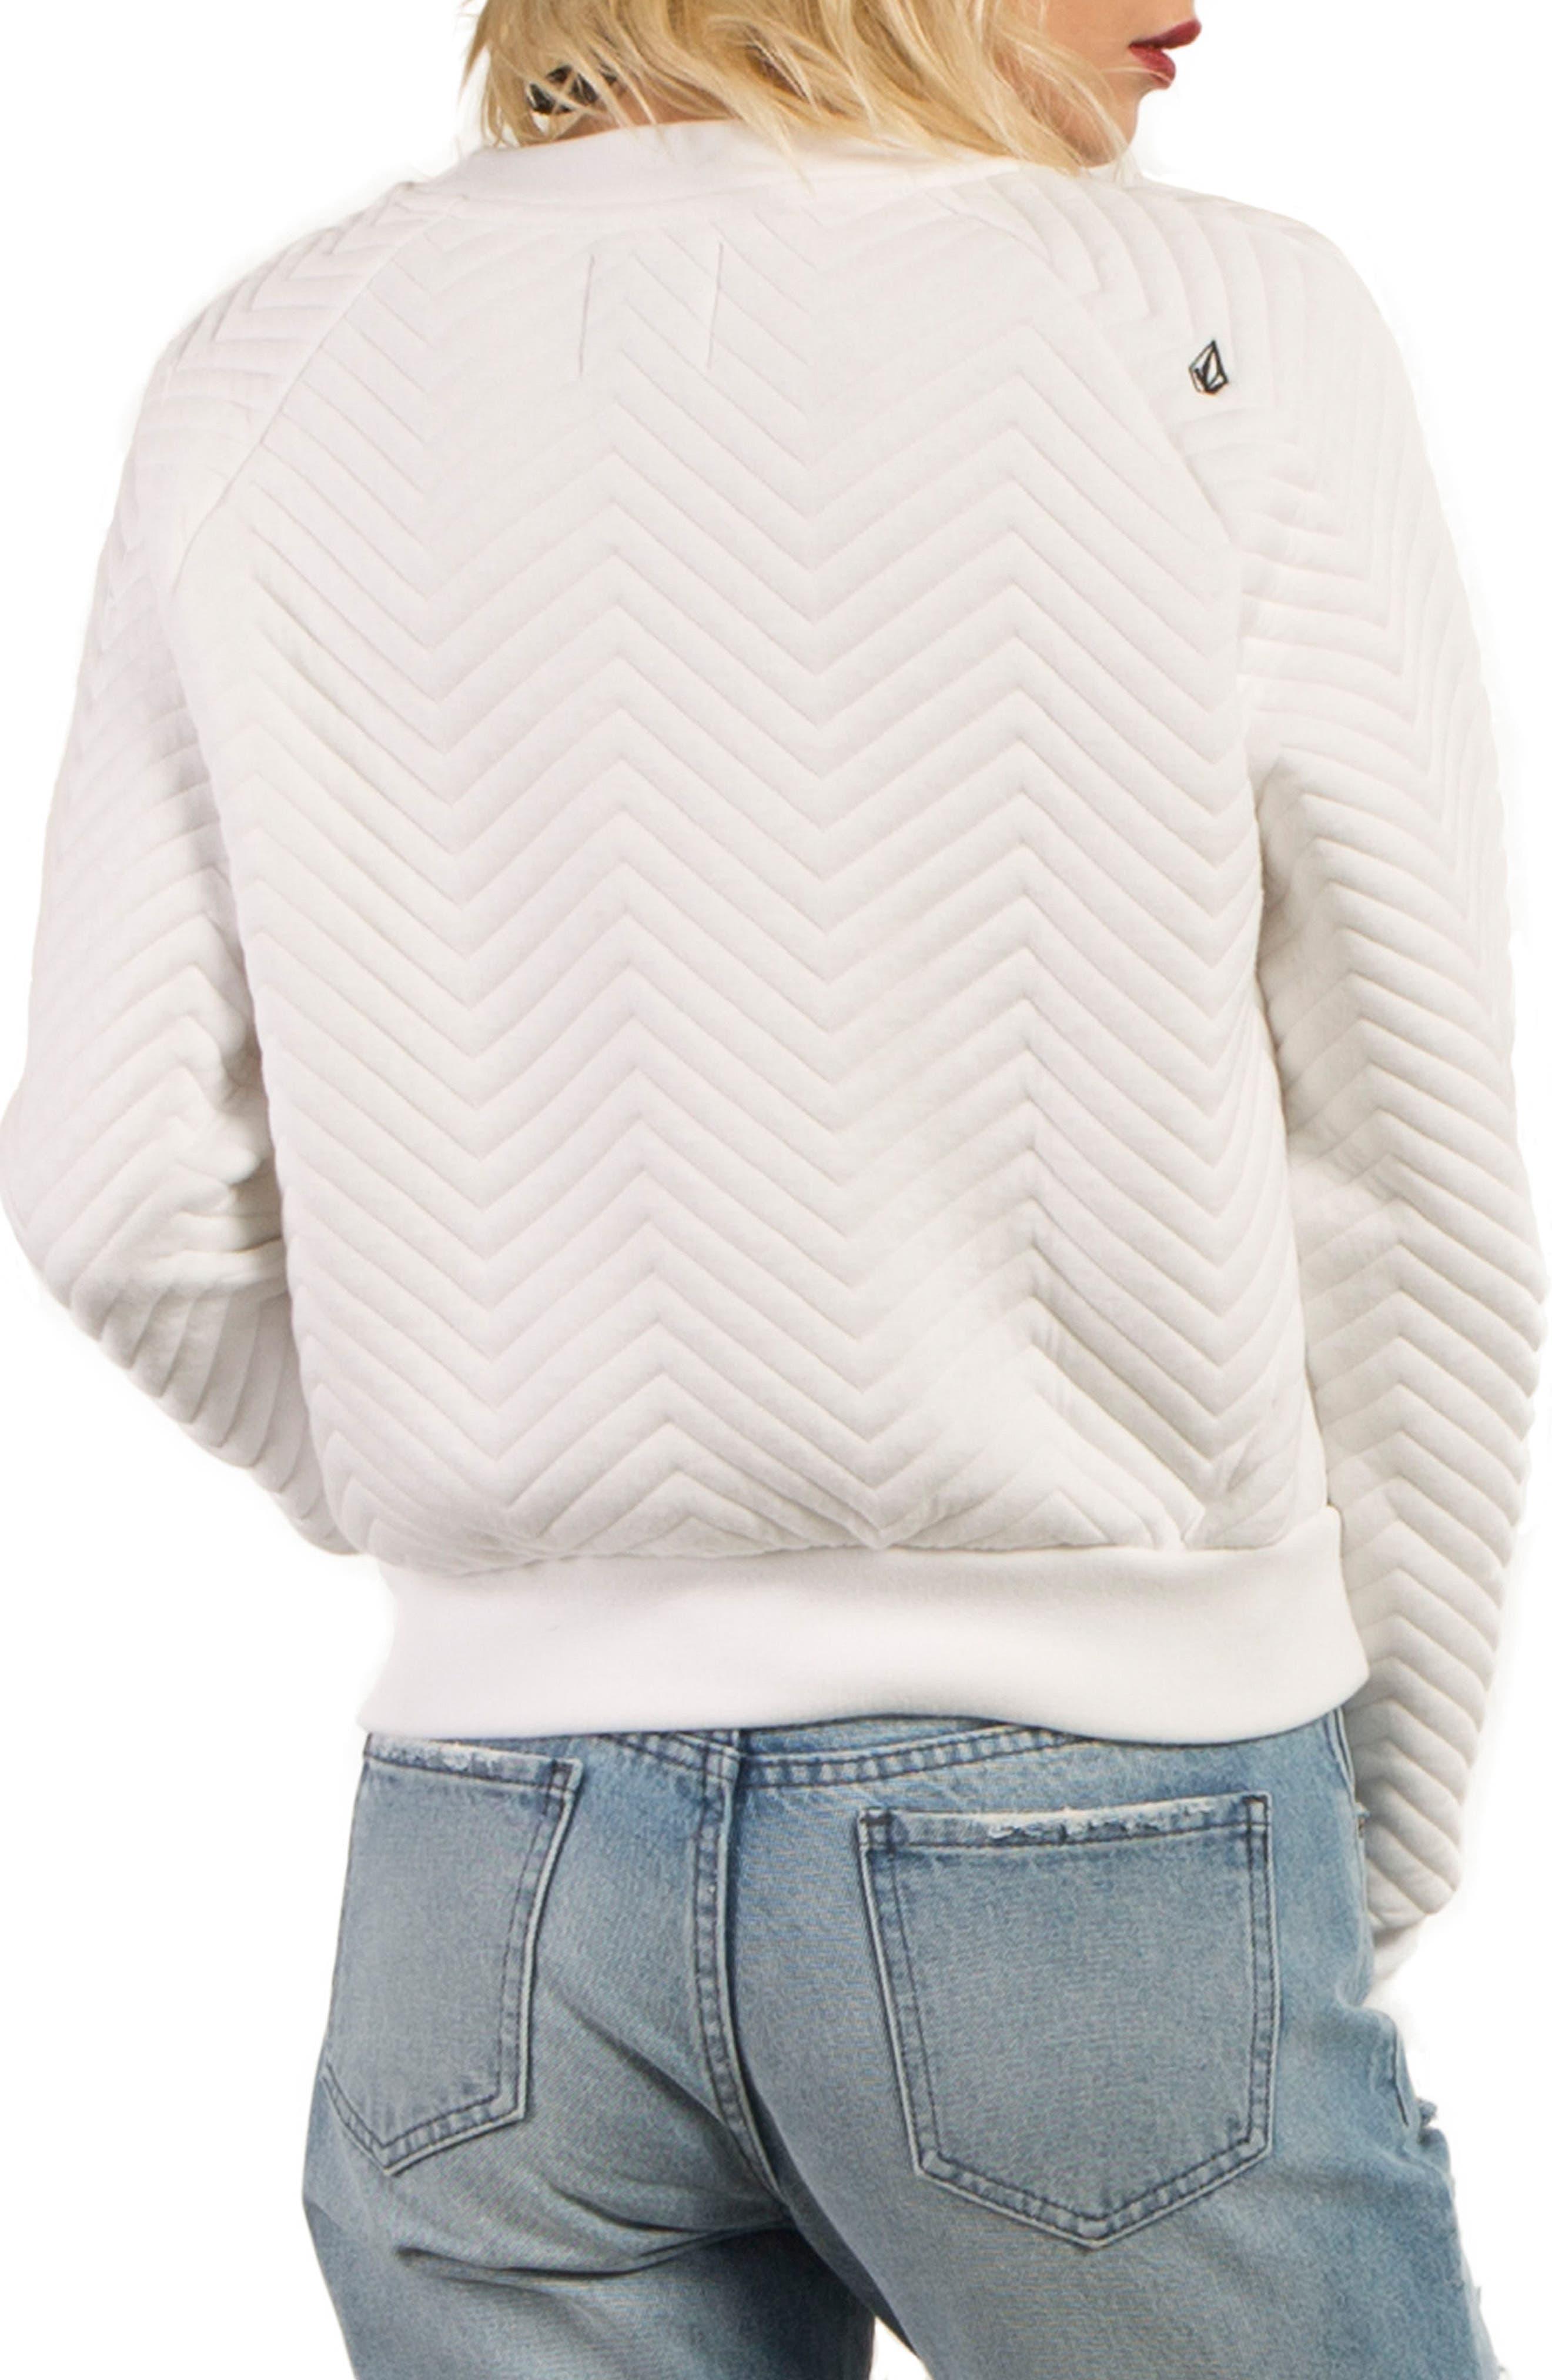 Cozy Dayz Sweatshirt,                             Alternate thumbnail 2, color,                             100